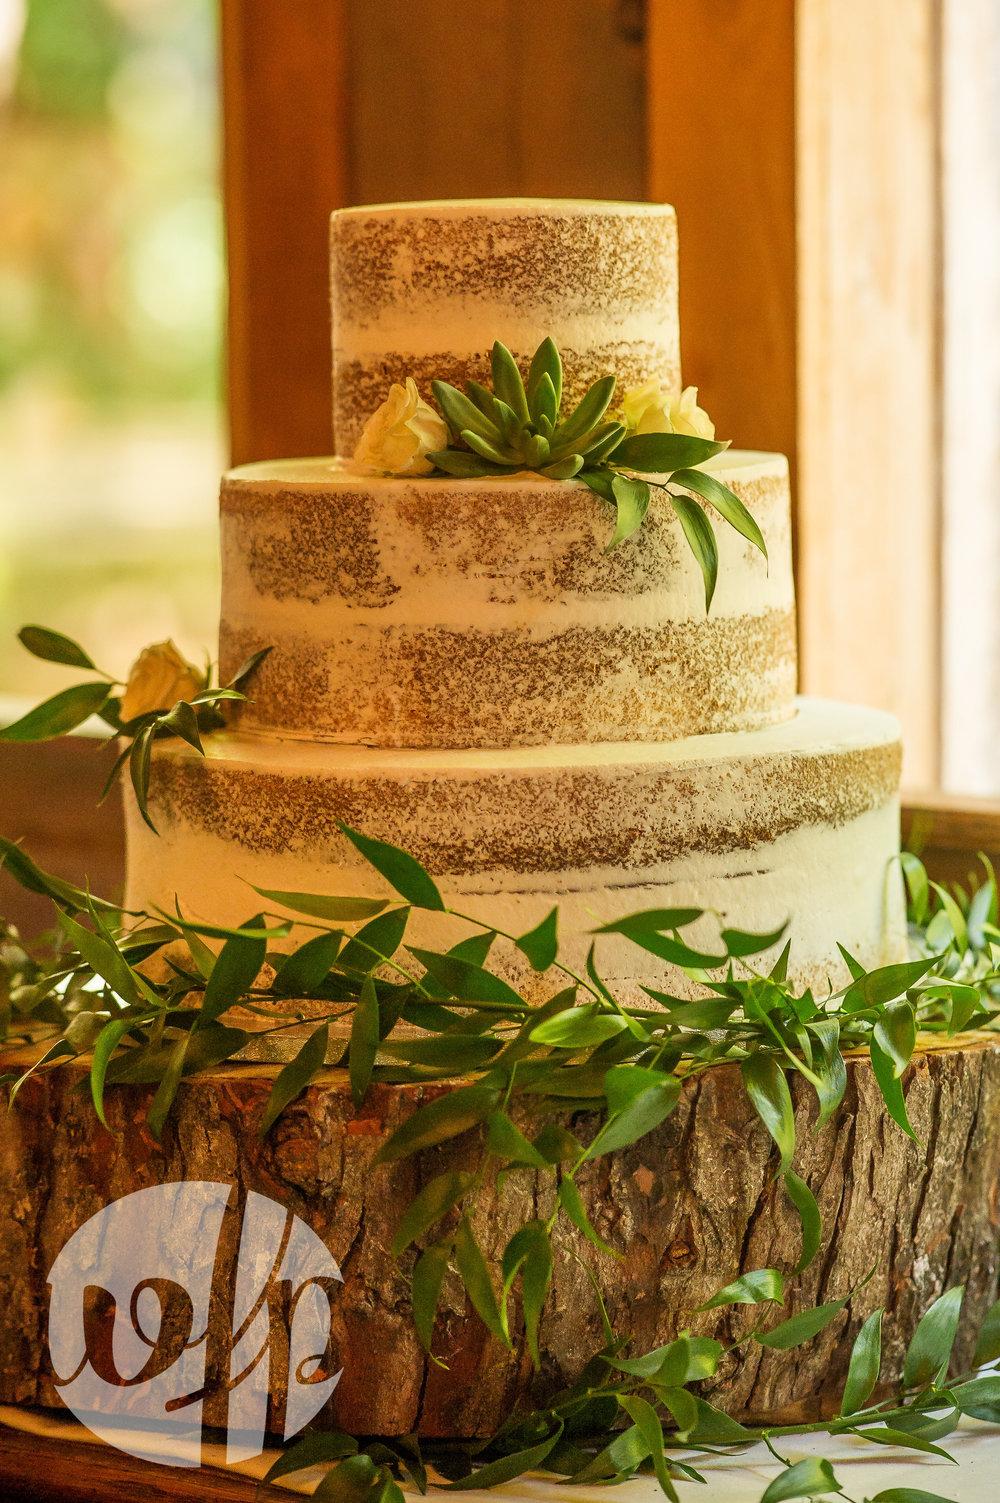 Semi Naked Cake with Greenery